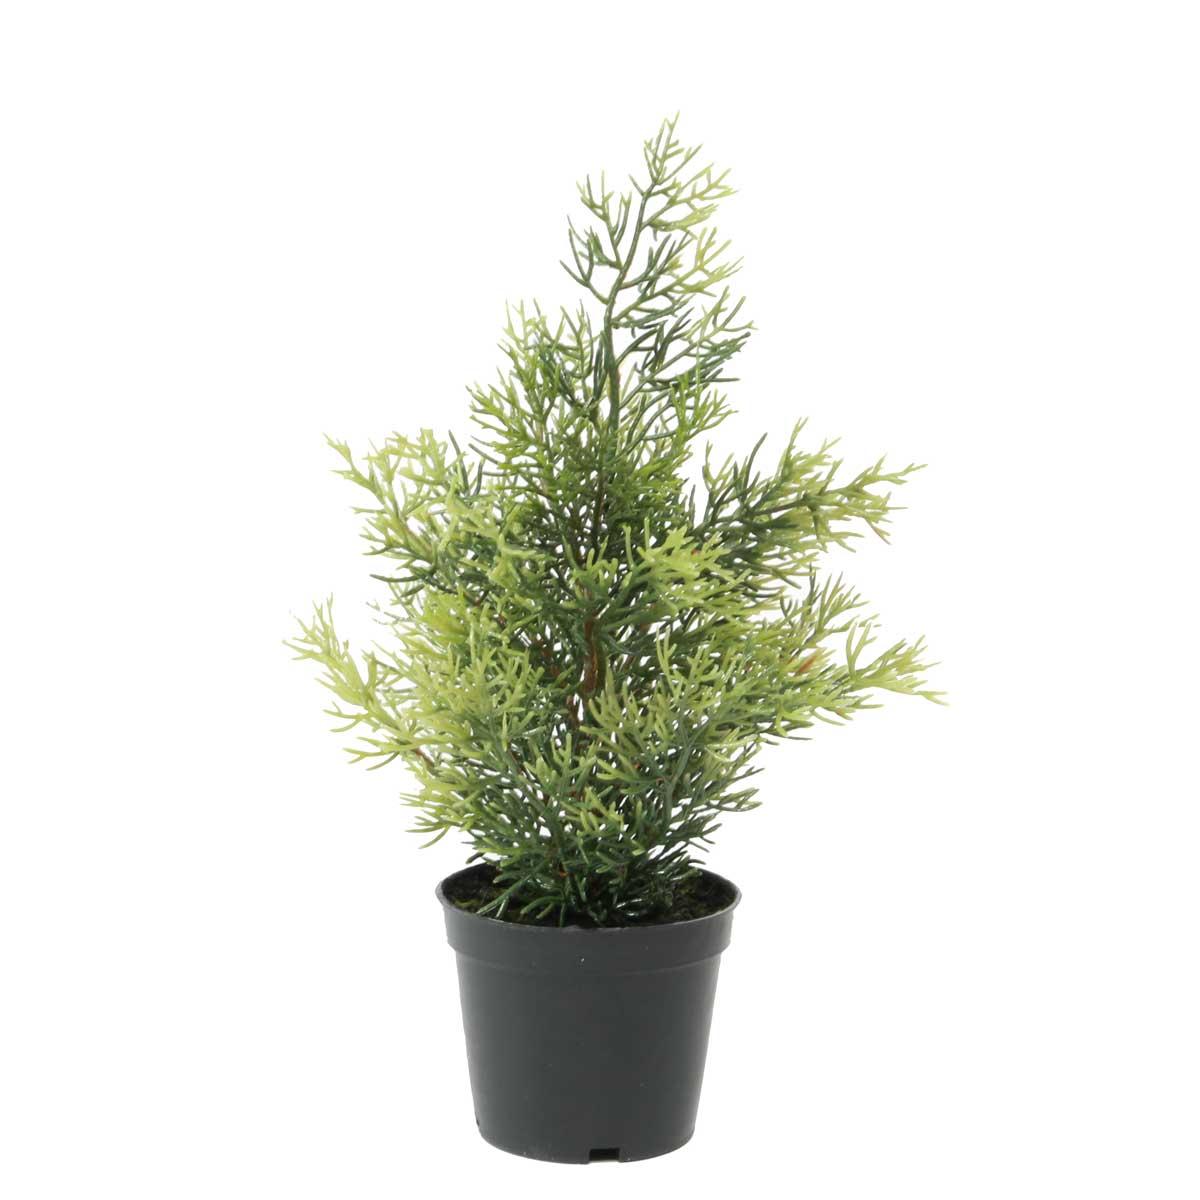 "ARBORVITAE TREE IN POT 11"""